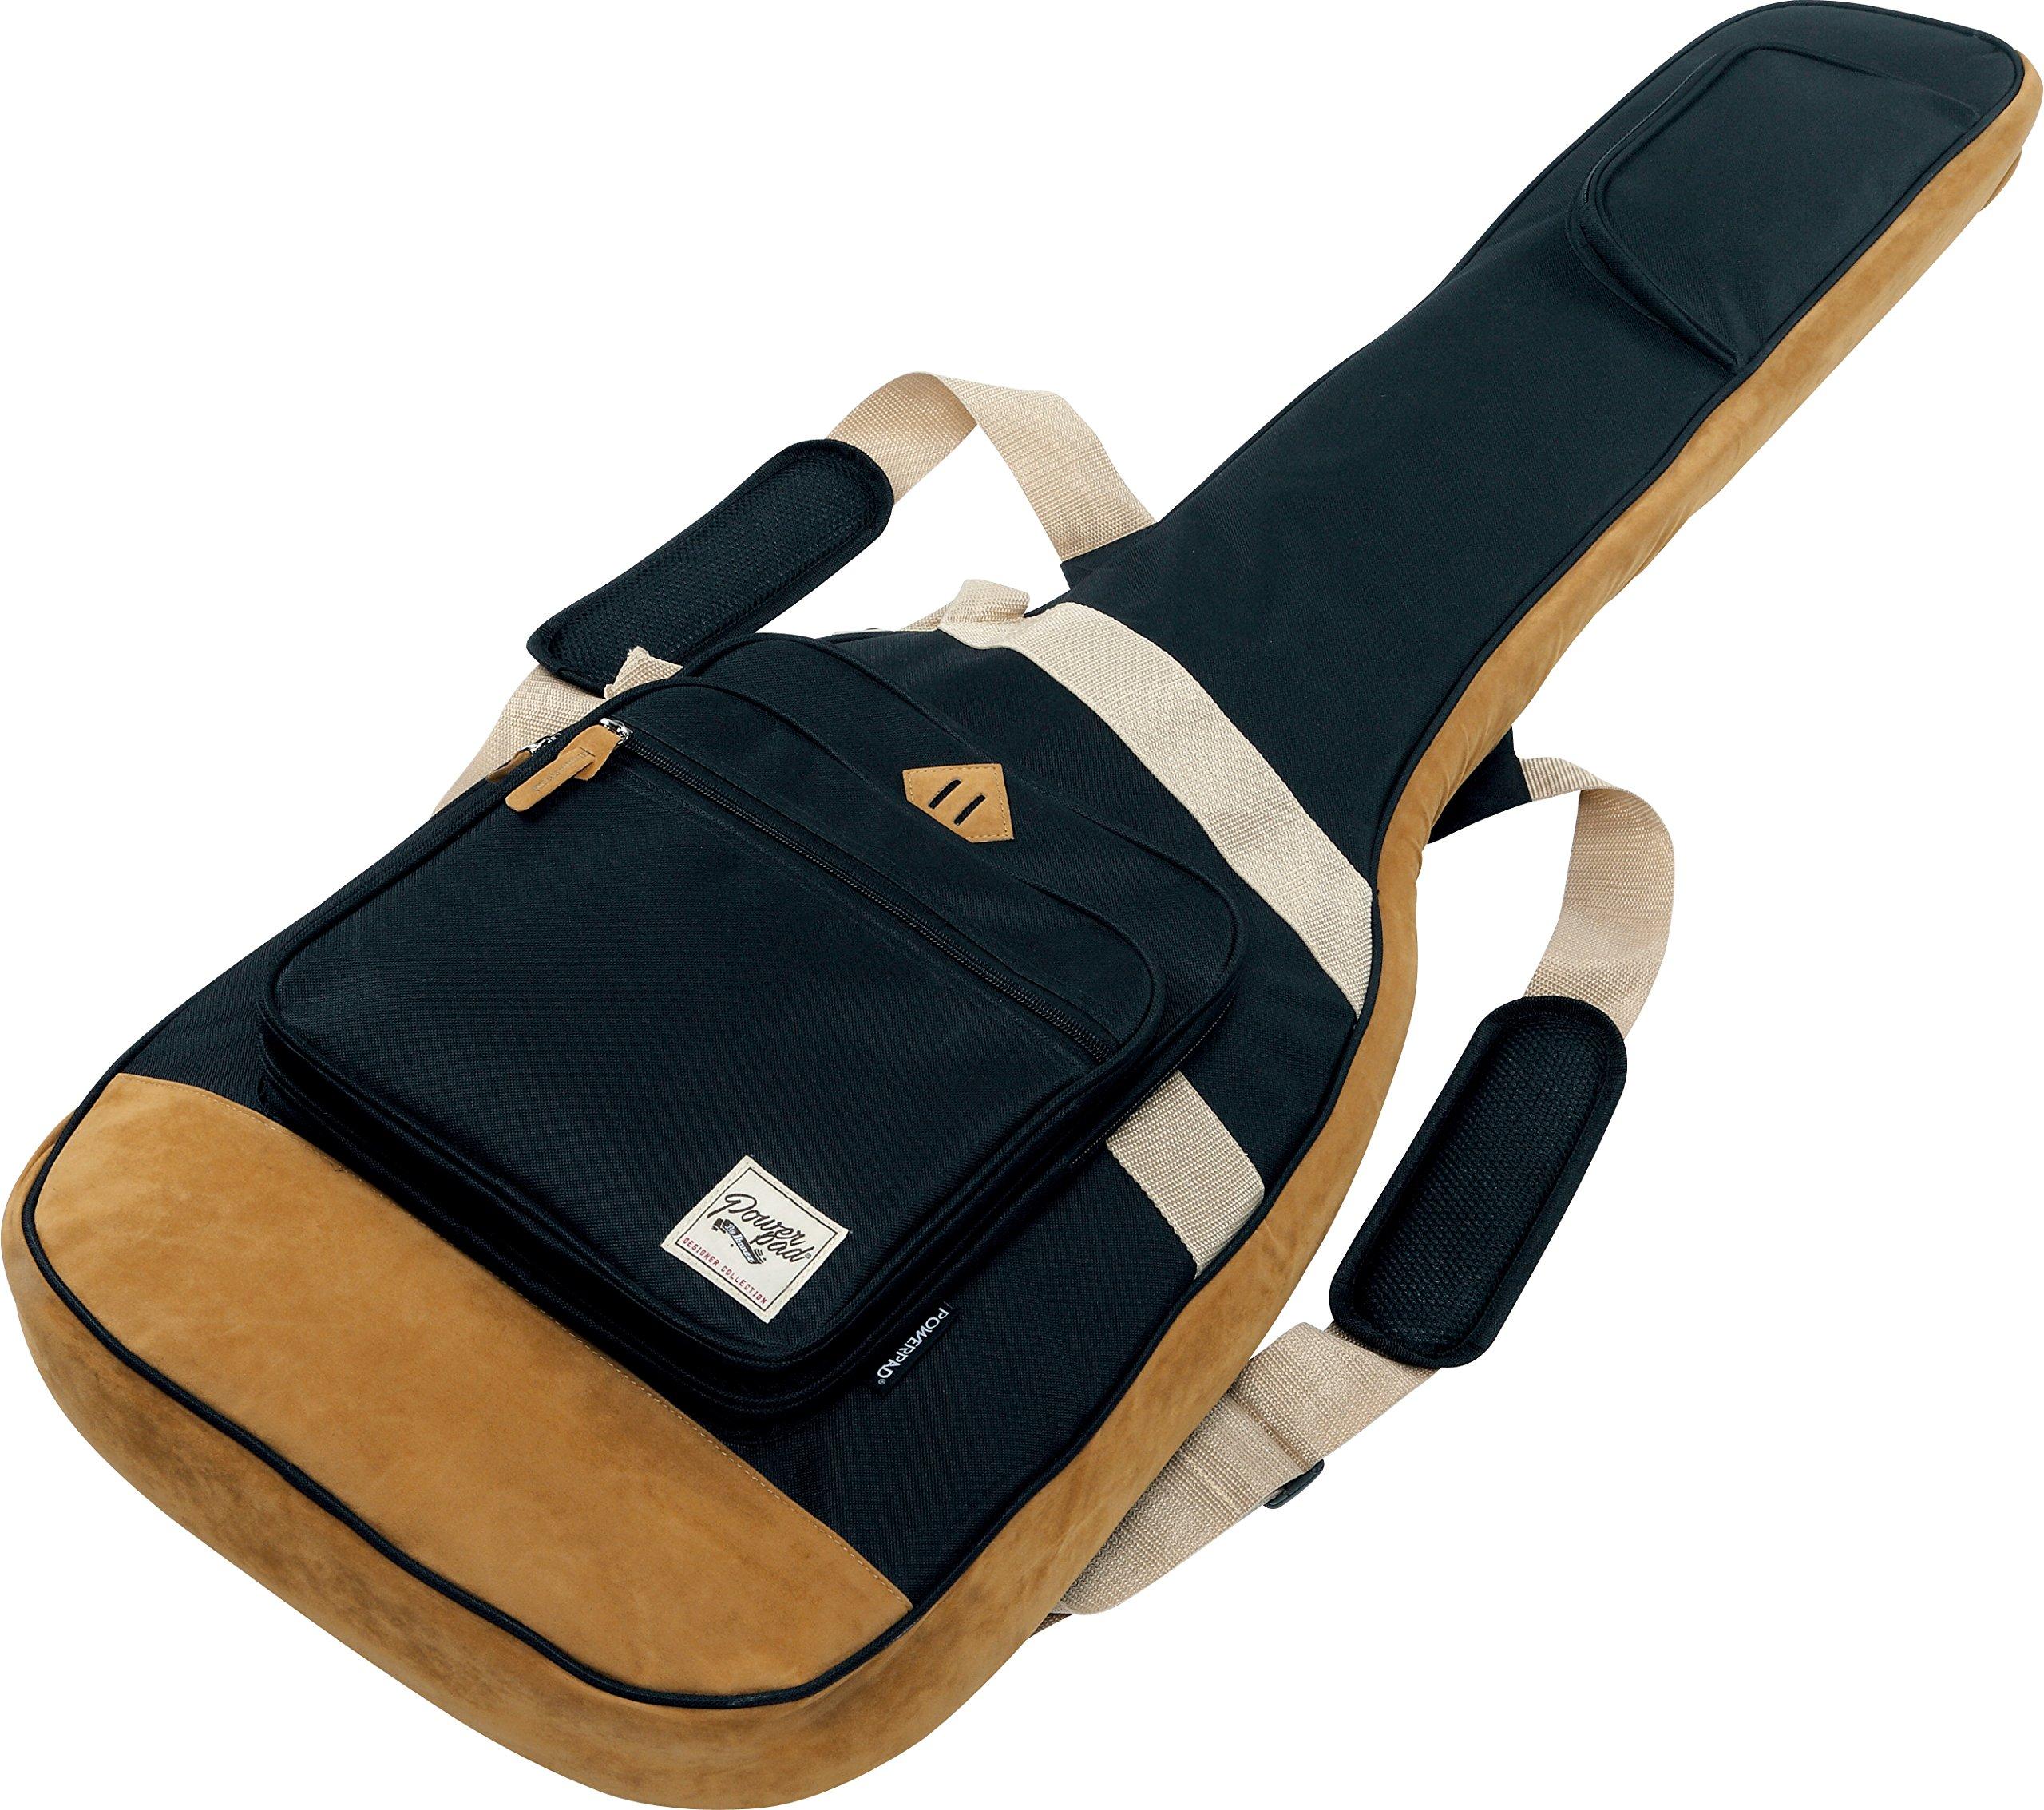 Ibanez IBB541BK POWERPAD Bass Guitar Gig Bag, Black